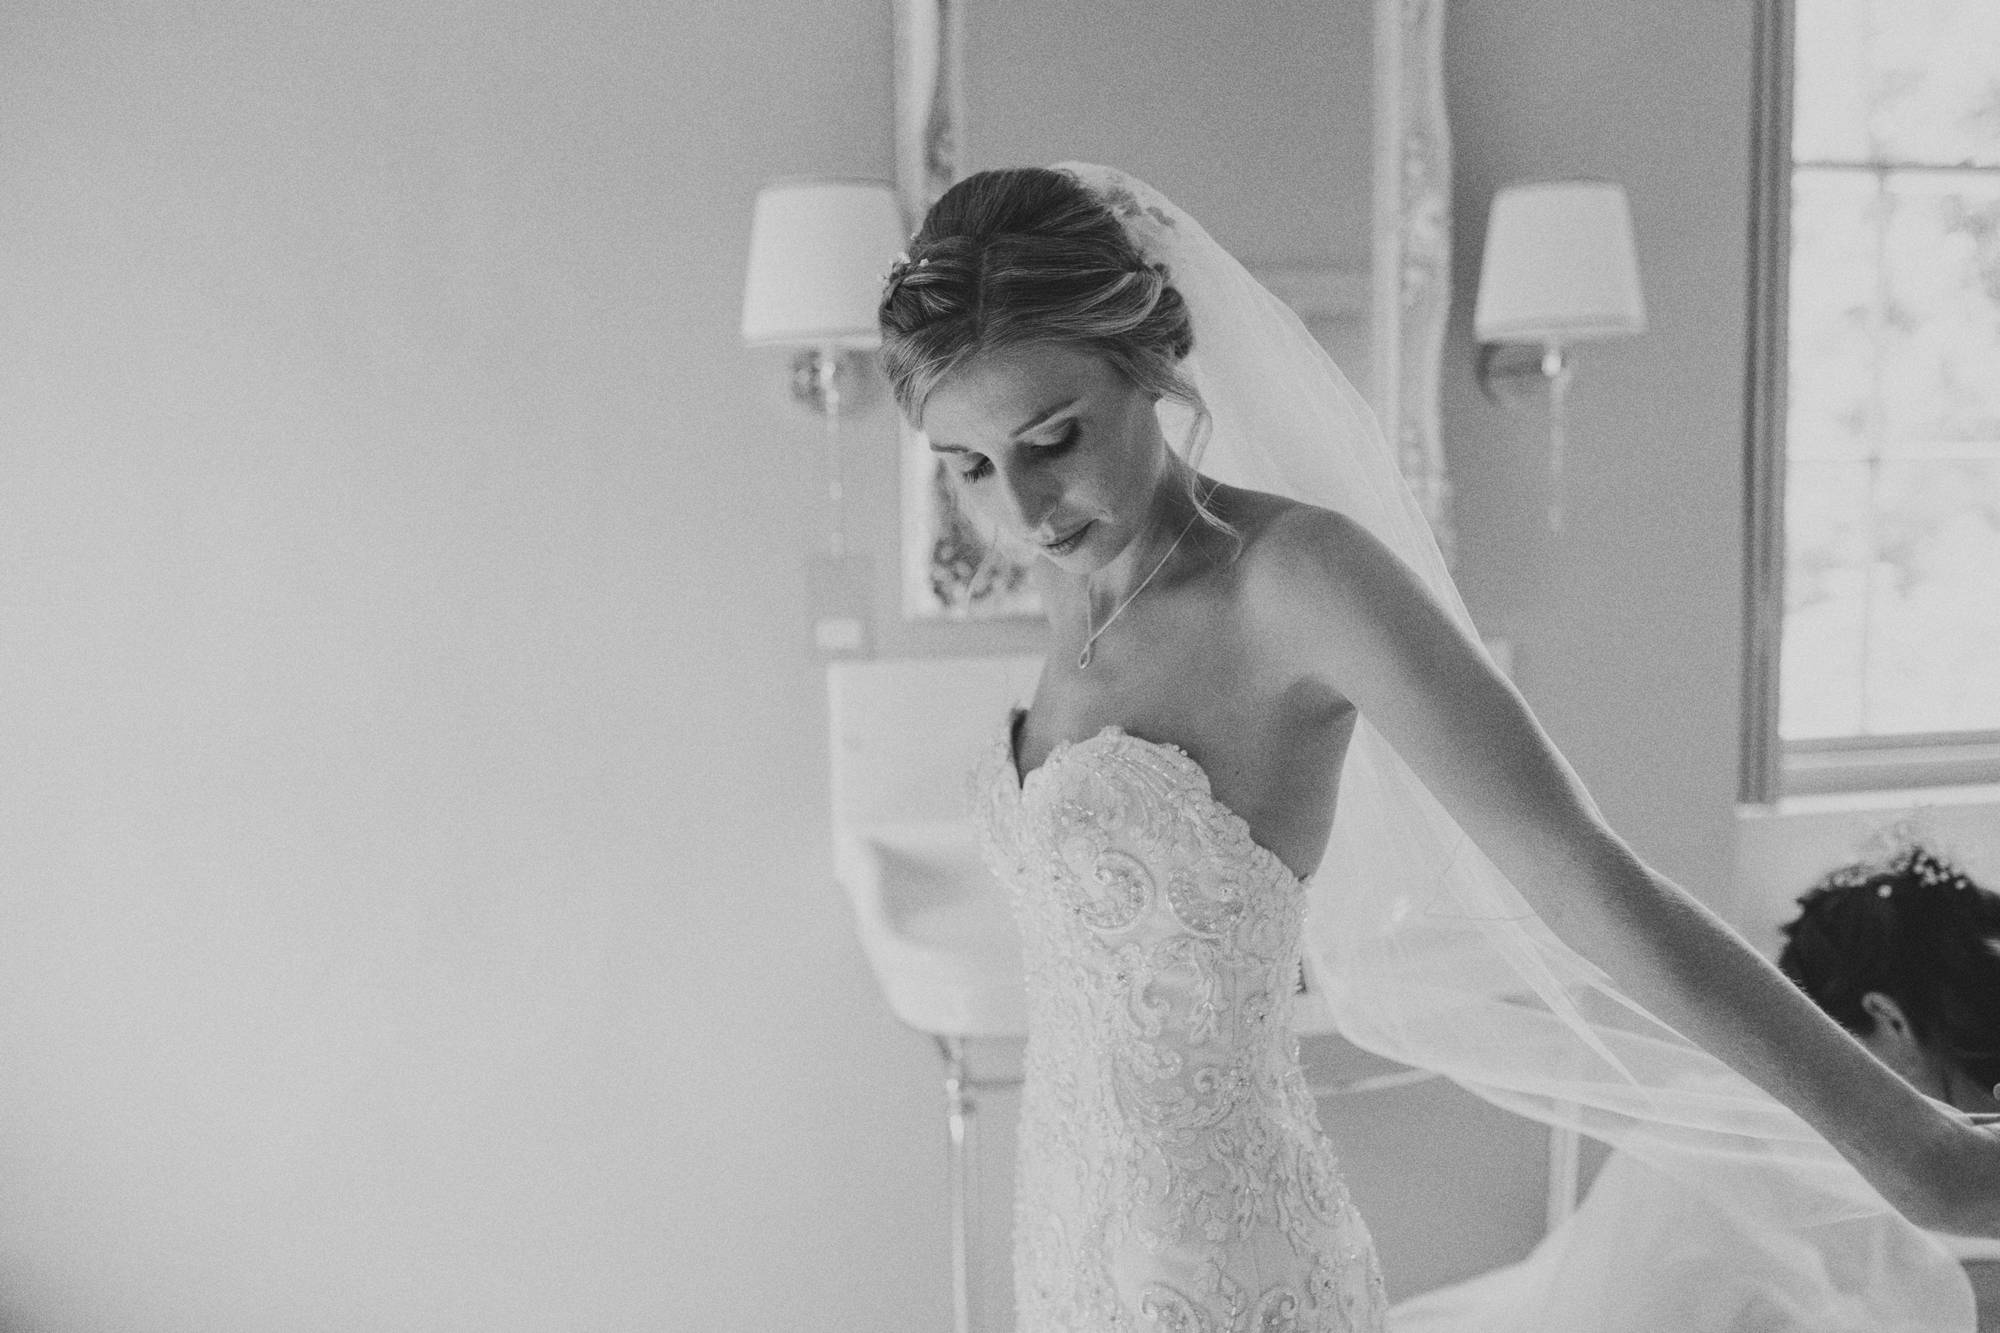 black and white shot of bride putting on wedding dress